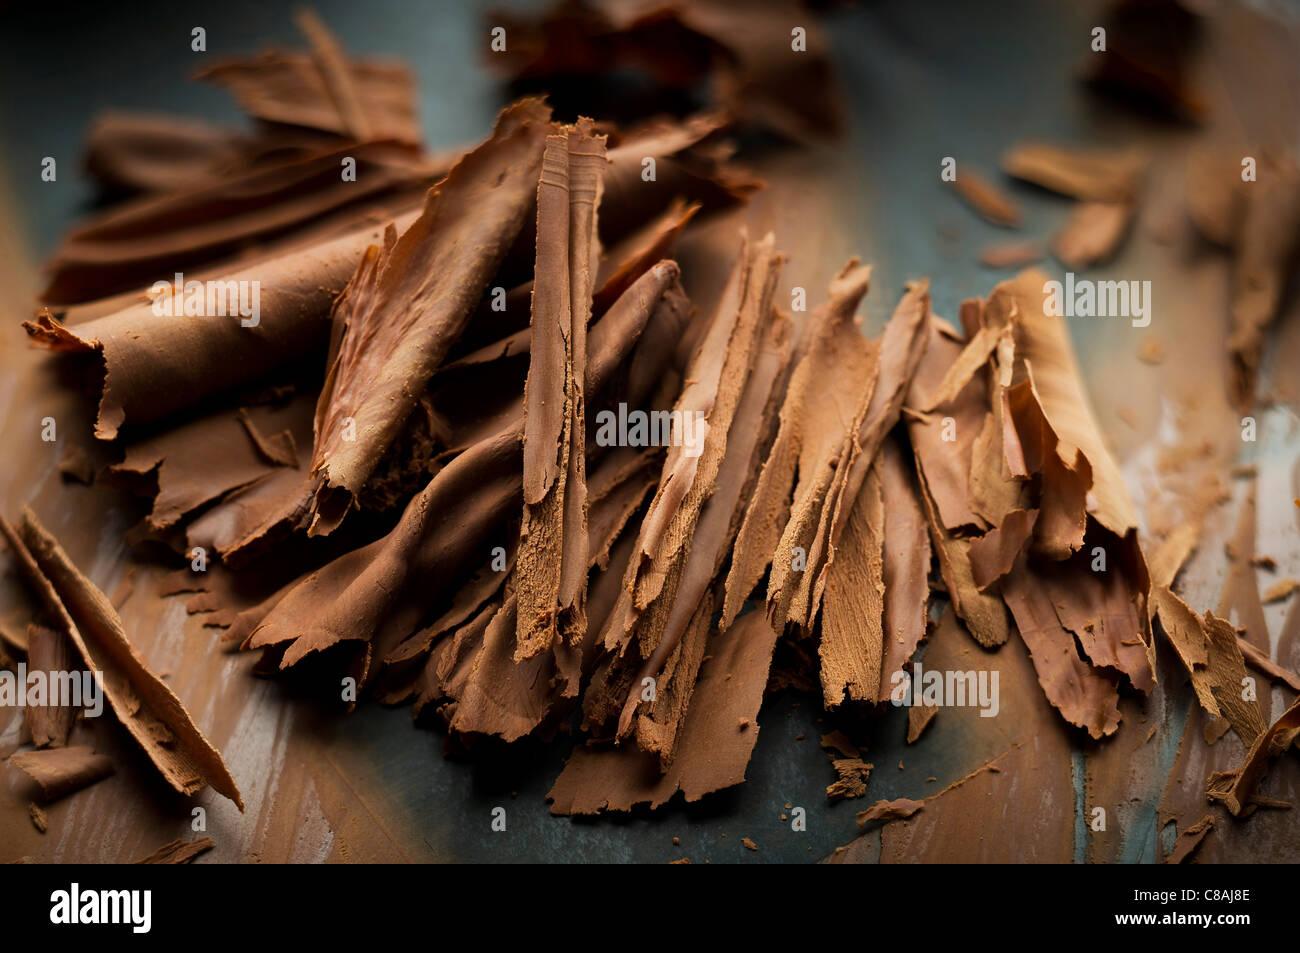 Schokoladenflocken Stockbild